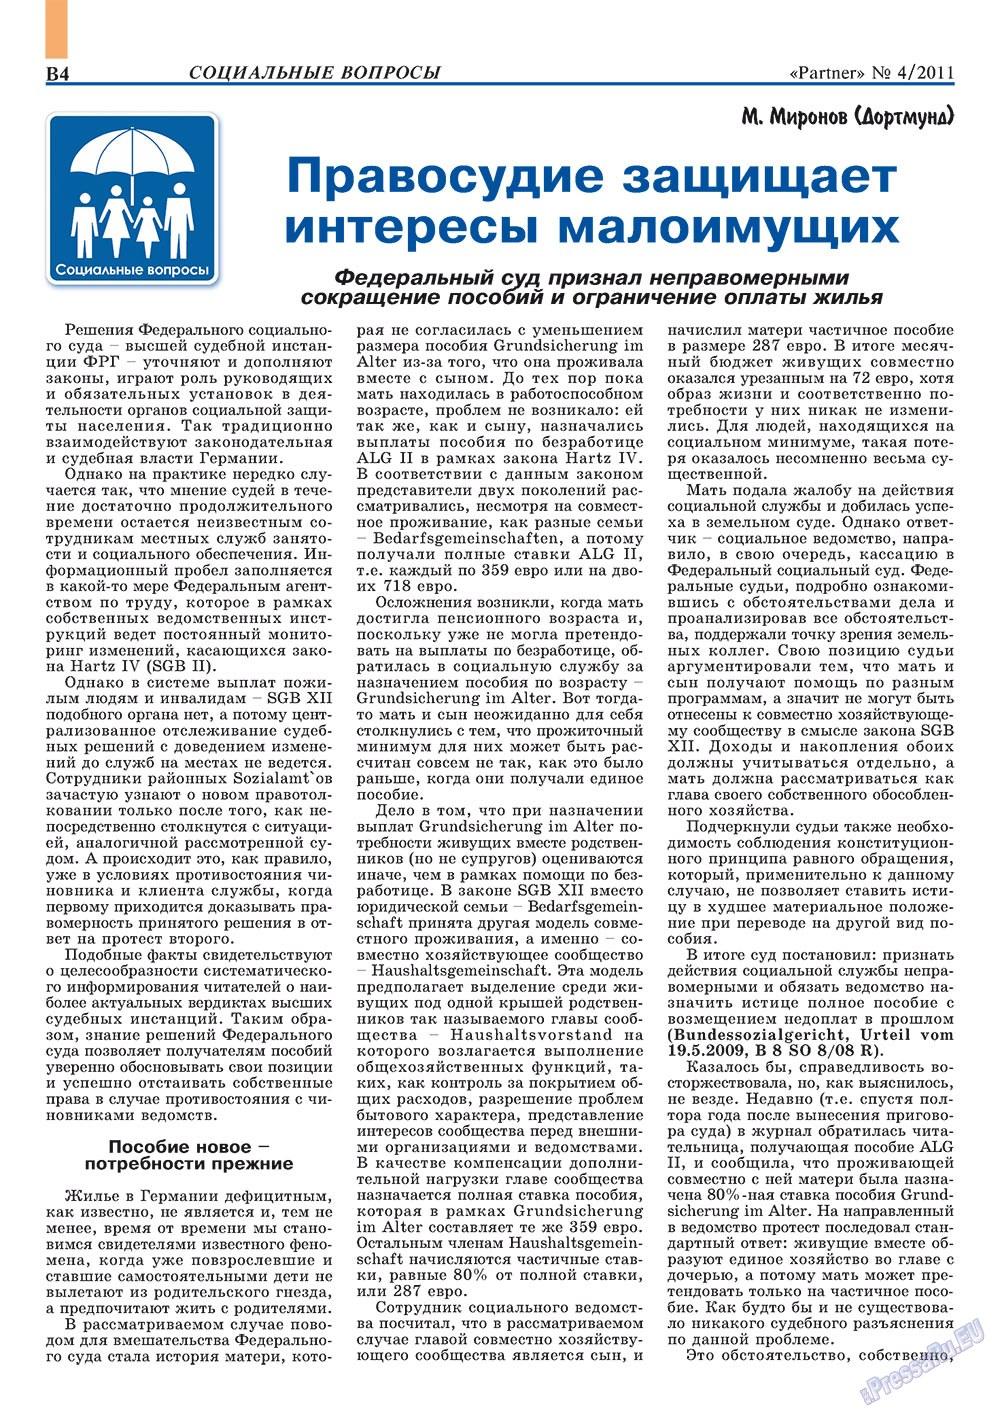 Партнер-север (журнал). 2011 год, номер 4, стр. 14